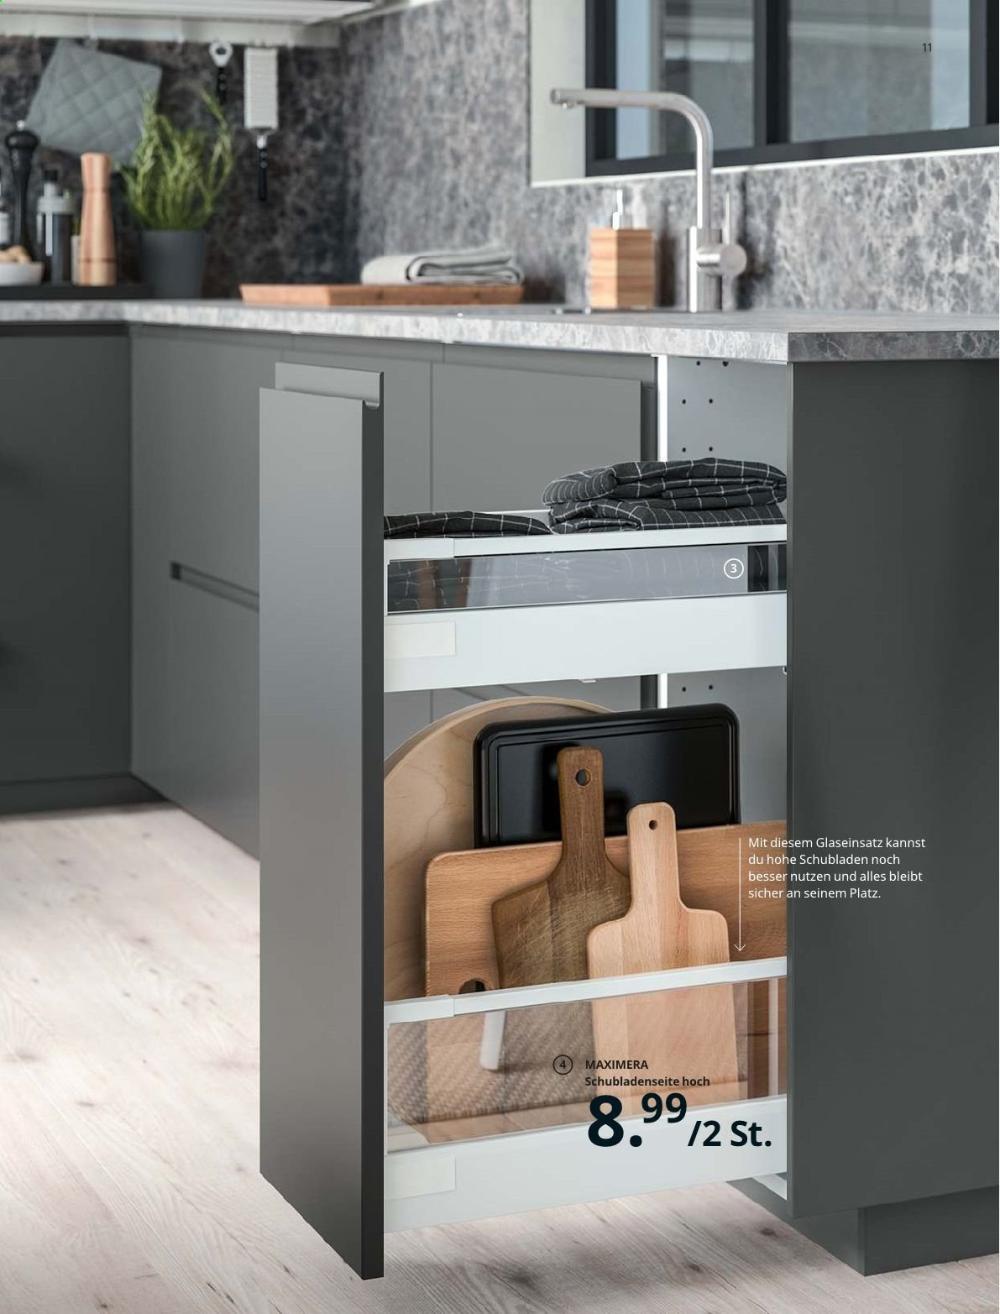 Ikea Aktuelles Prospekt 2 9 2019 31 1 2020 Rabatt Kompass De In 2020 Arbeitsflachen Einbaukuche Ikea Arbeitsplatte